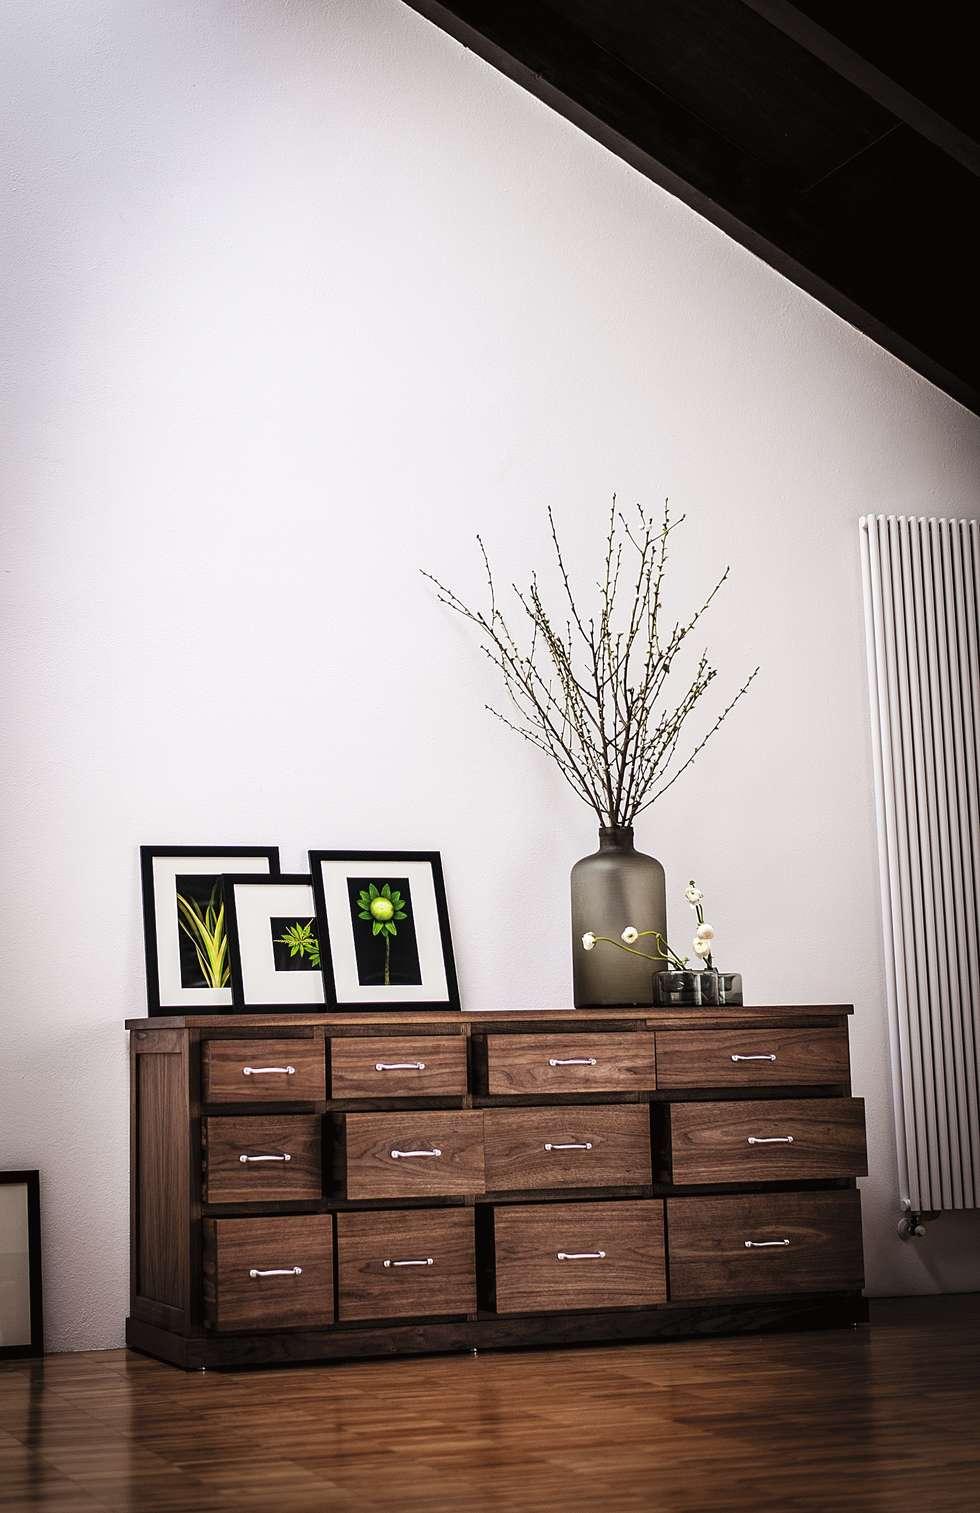 Boston design C.R. & S. Riva1920: Studio in stile in stile Moderno di Riva1920